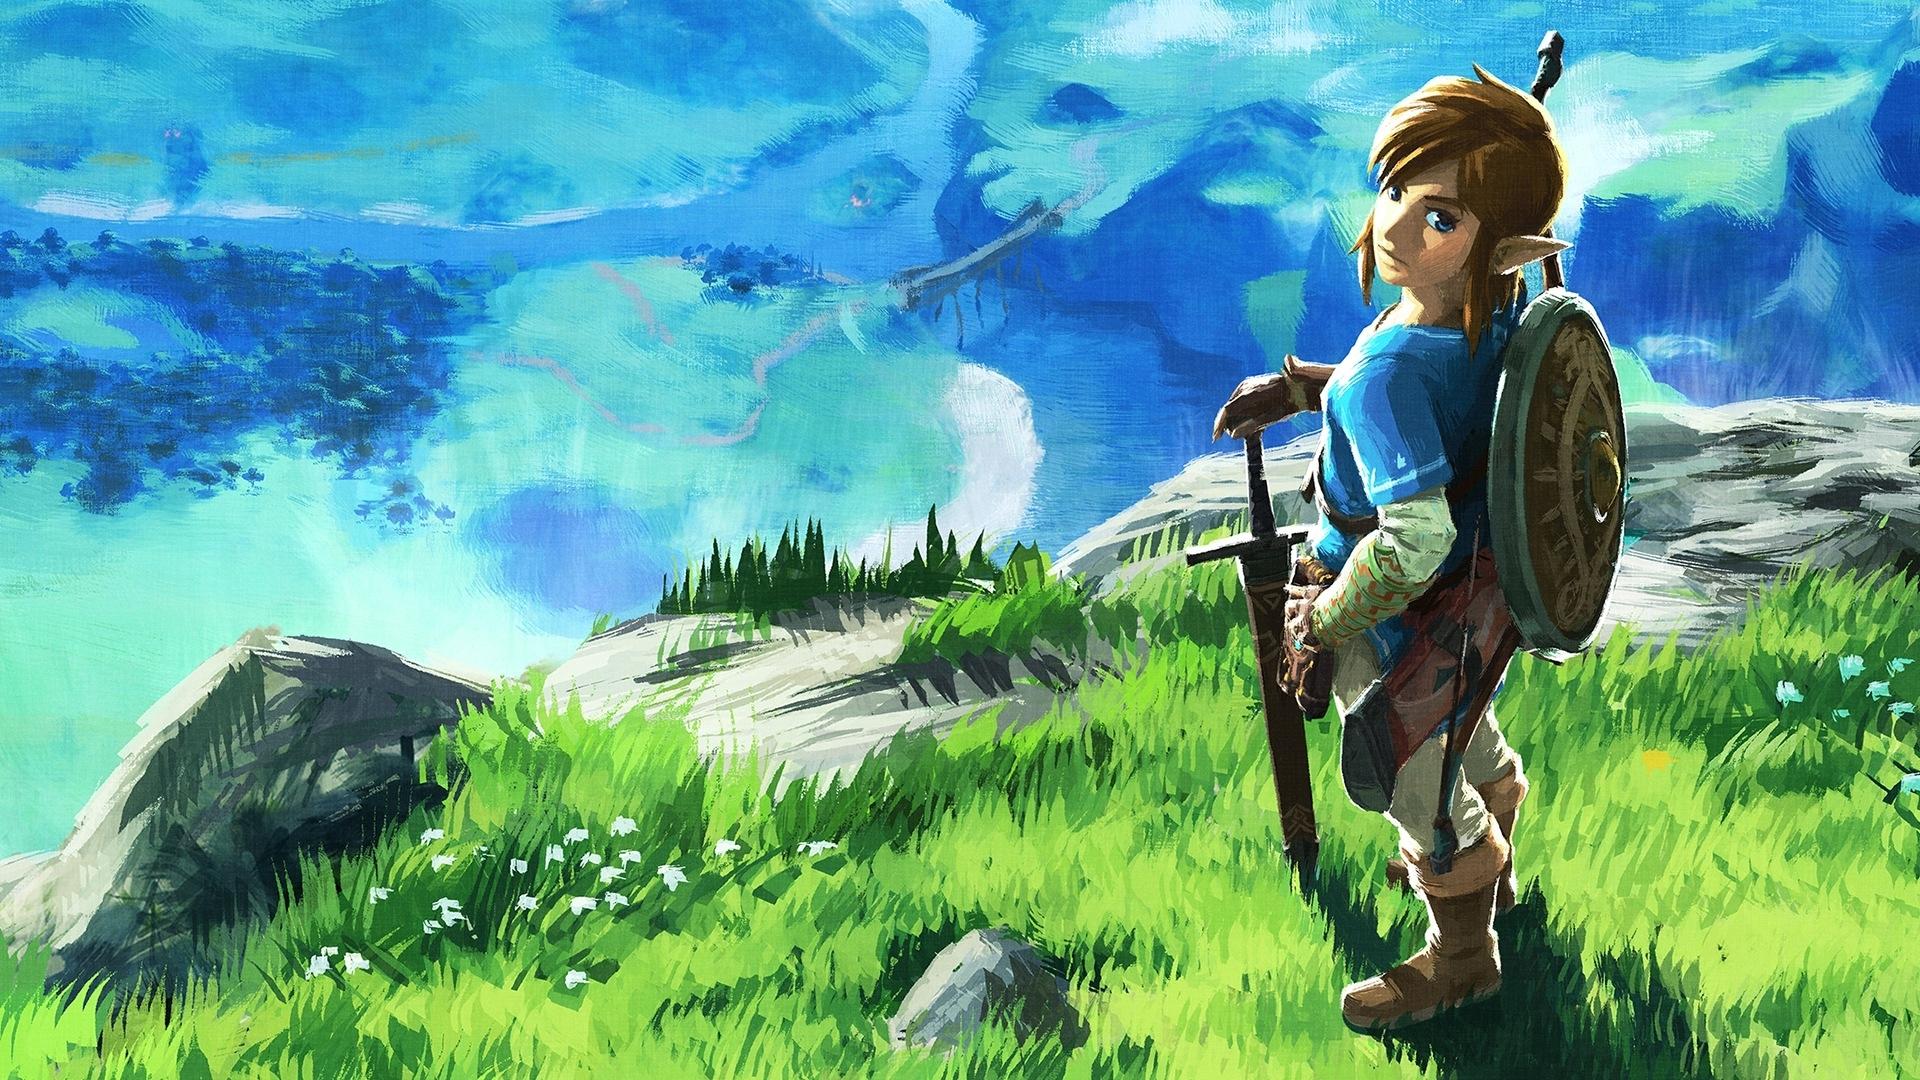 Free Download The Legend Of Zelda Breath Of The Wild Hd Wallpaper